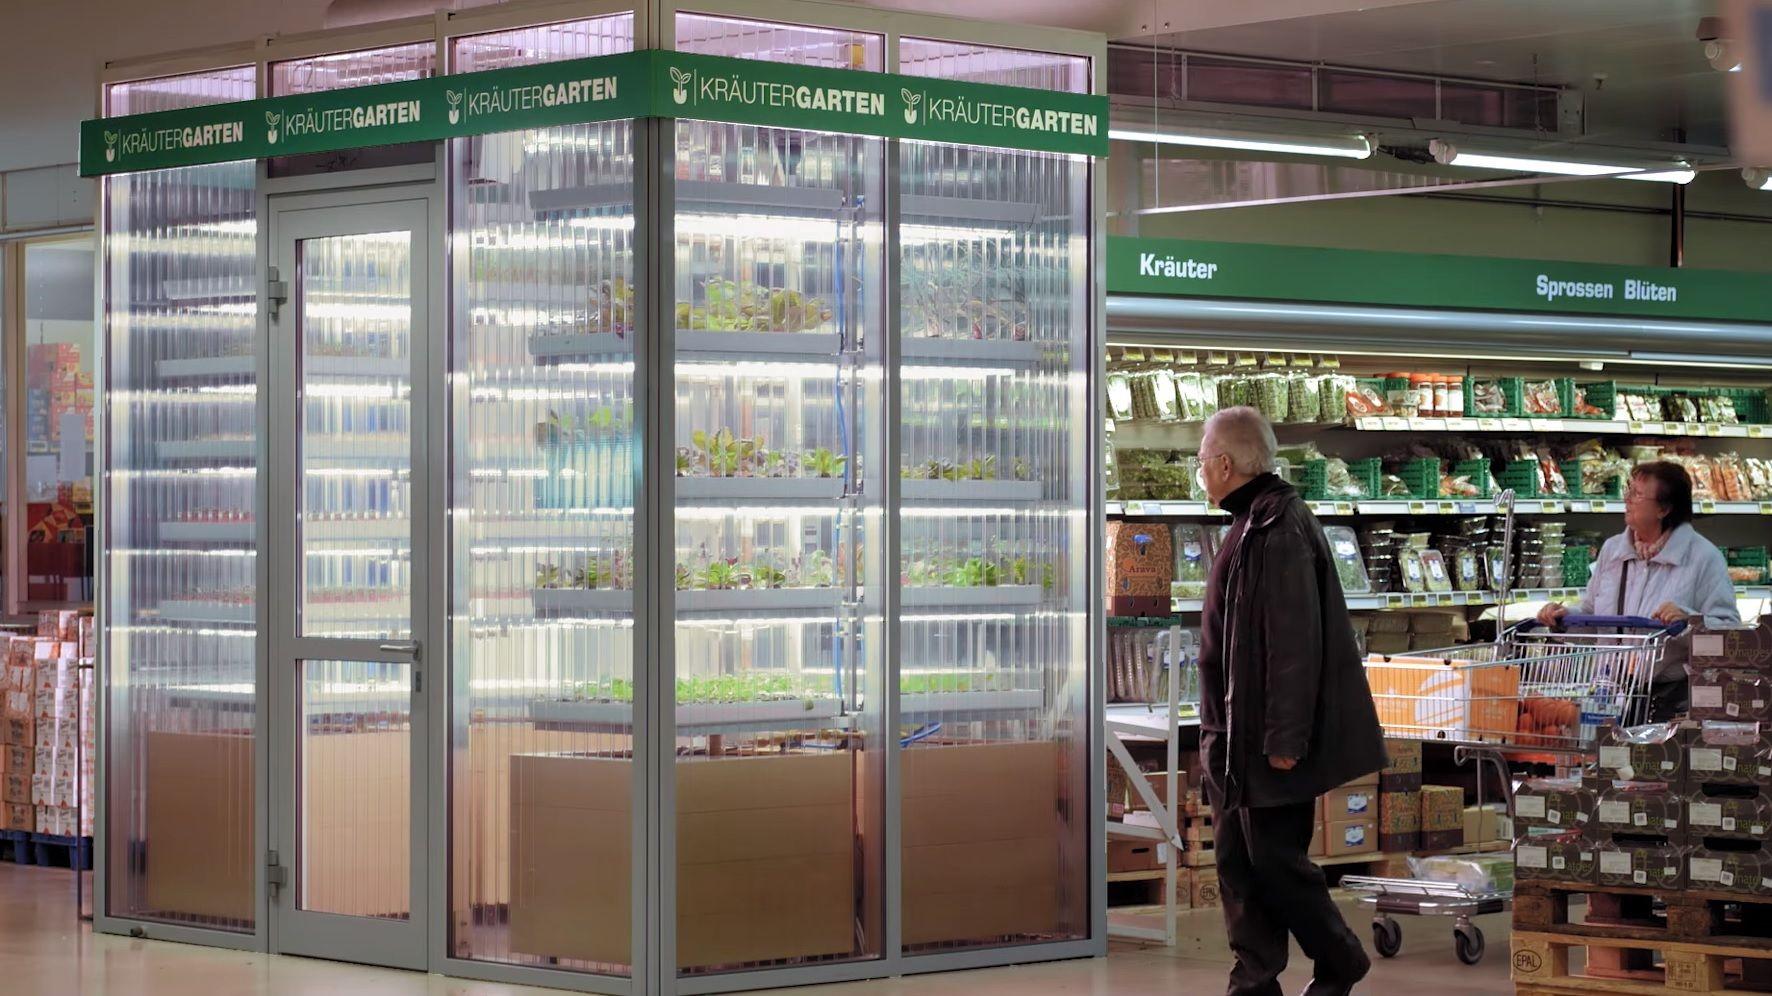 German Supermarket Turns Aisle Into Mini Farm